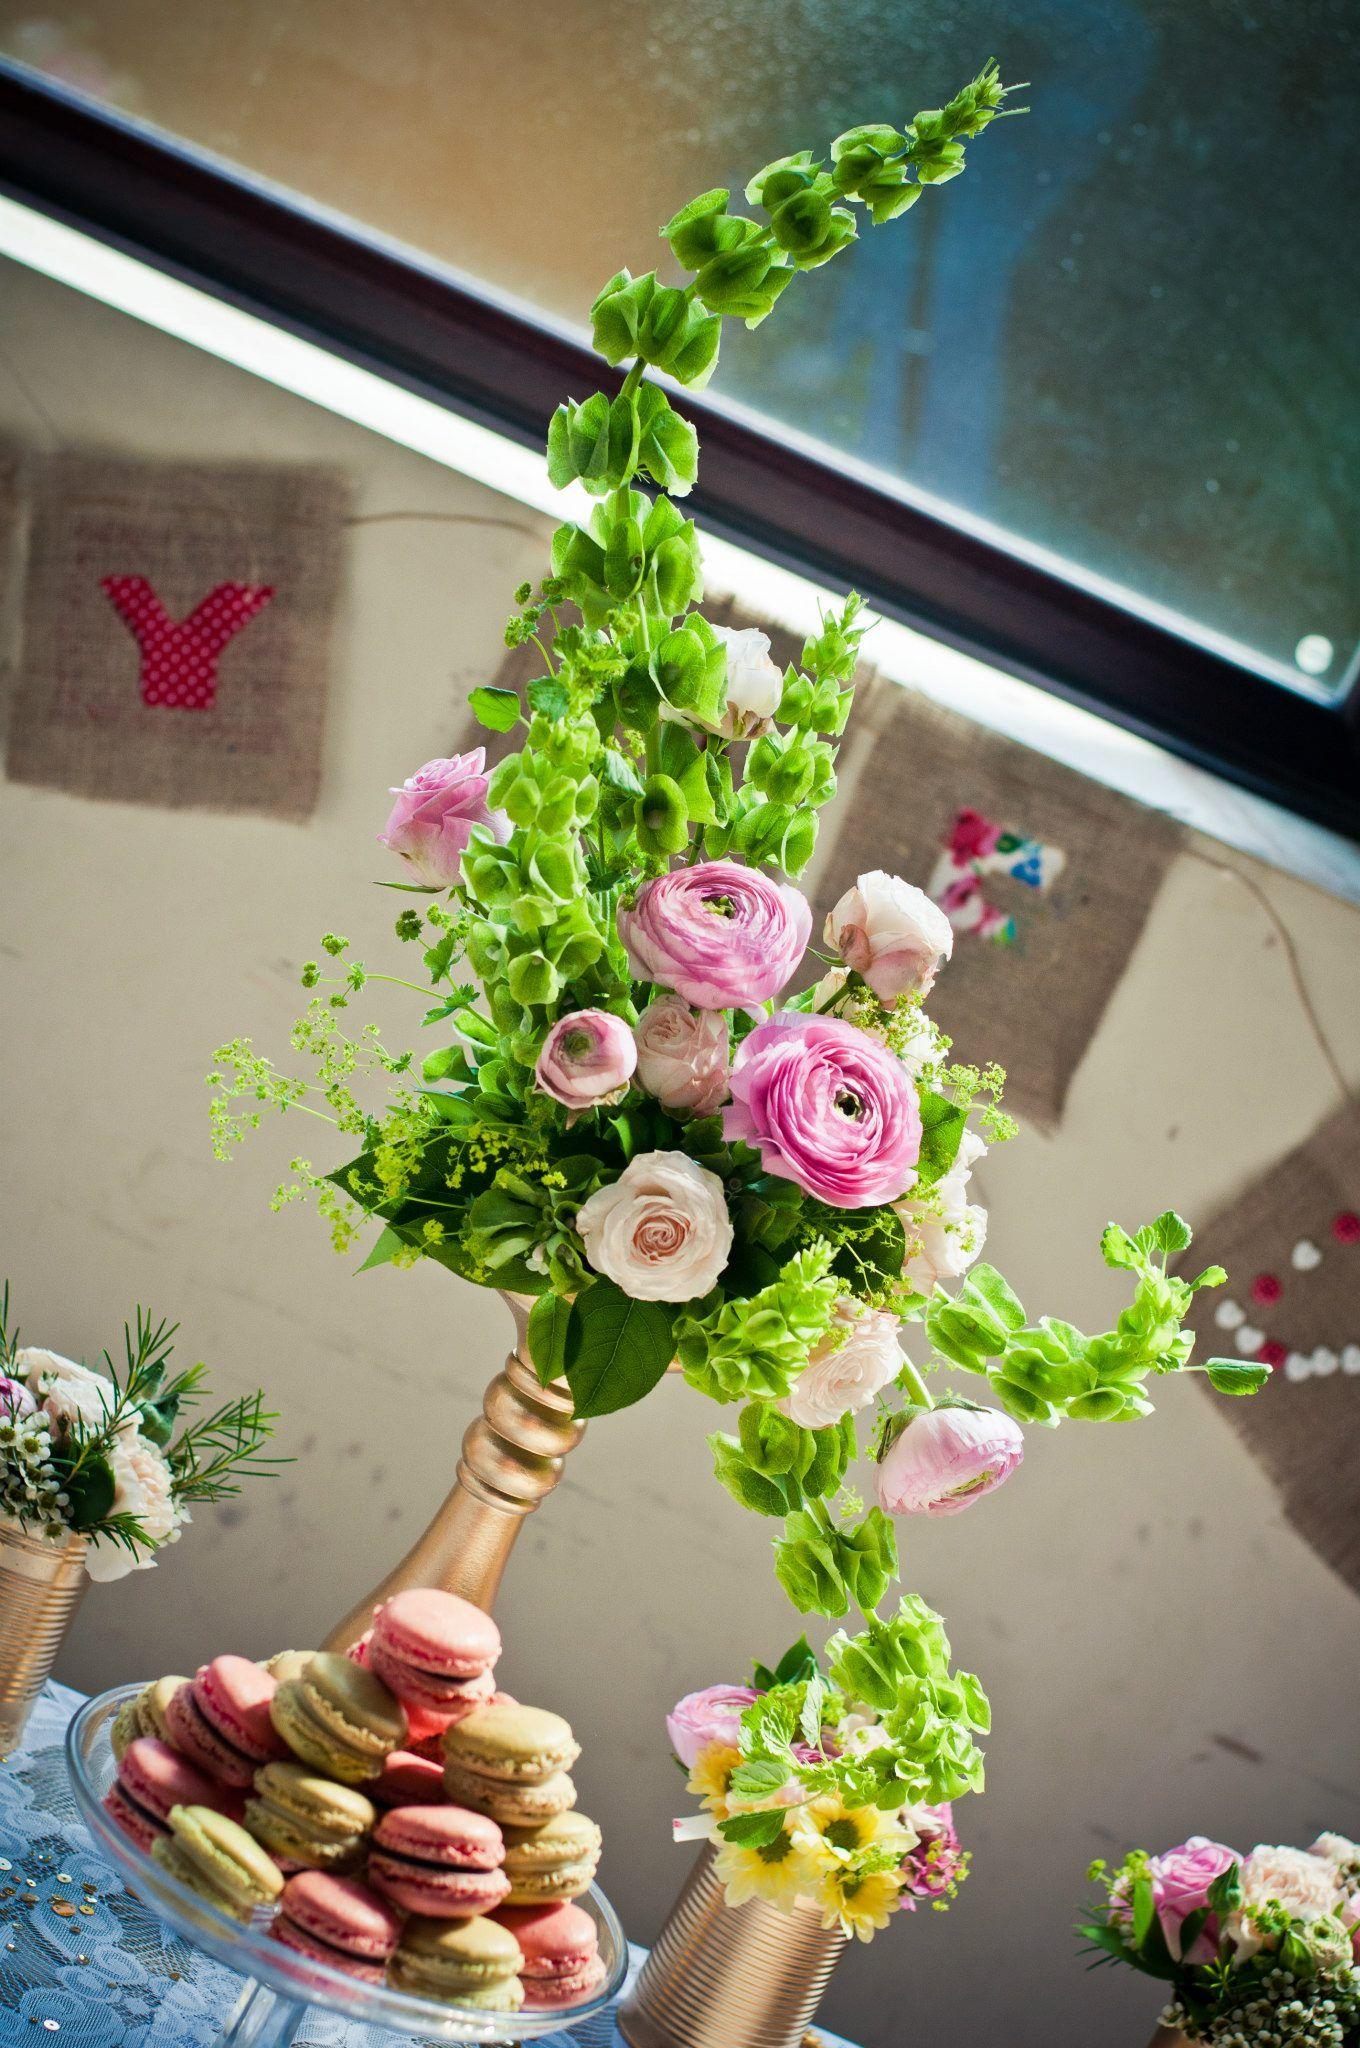 Hogarth Curve floral arrangement & Macarons | Flower ...